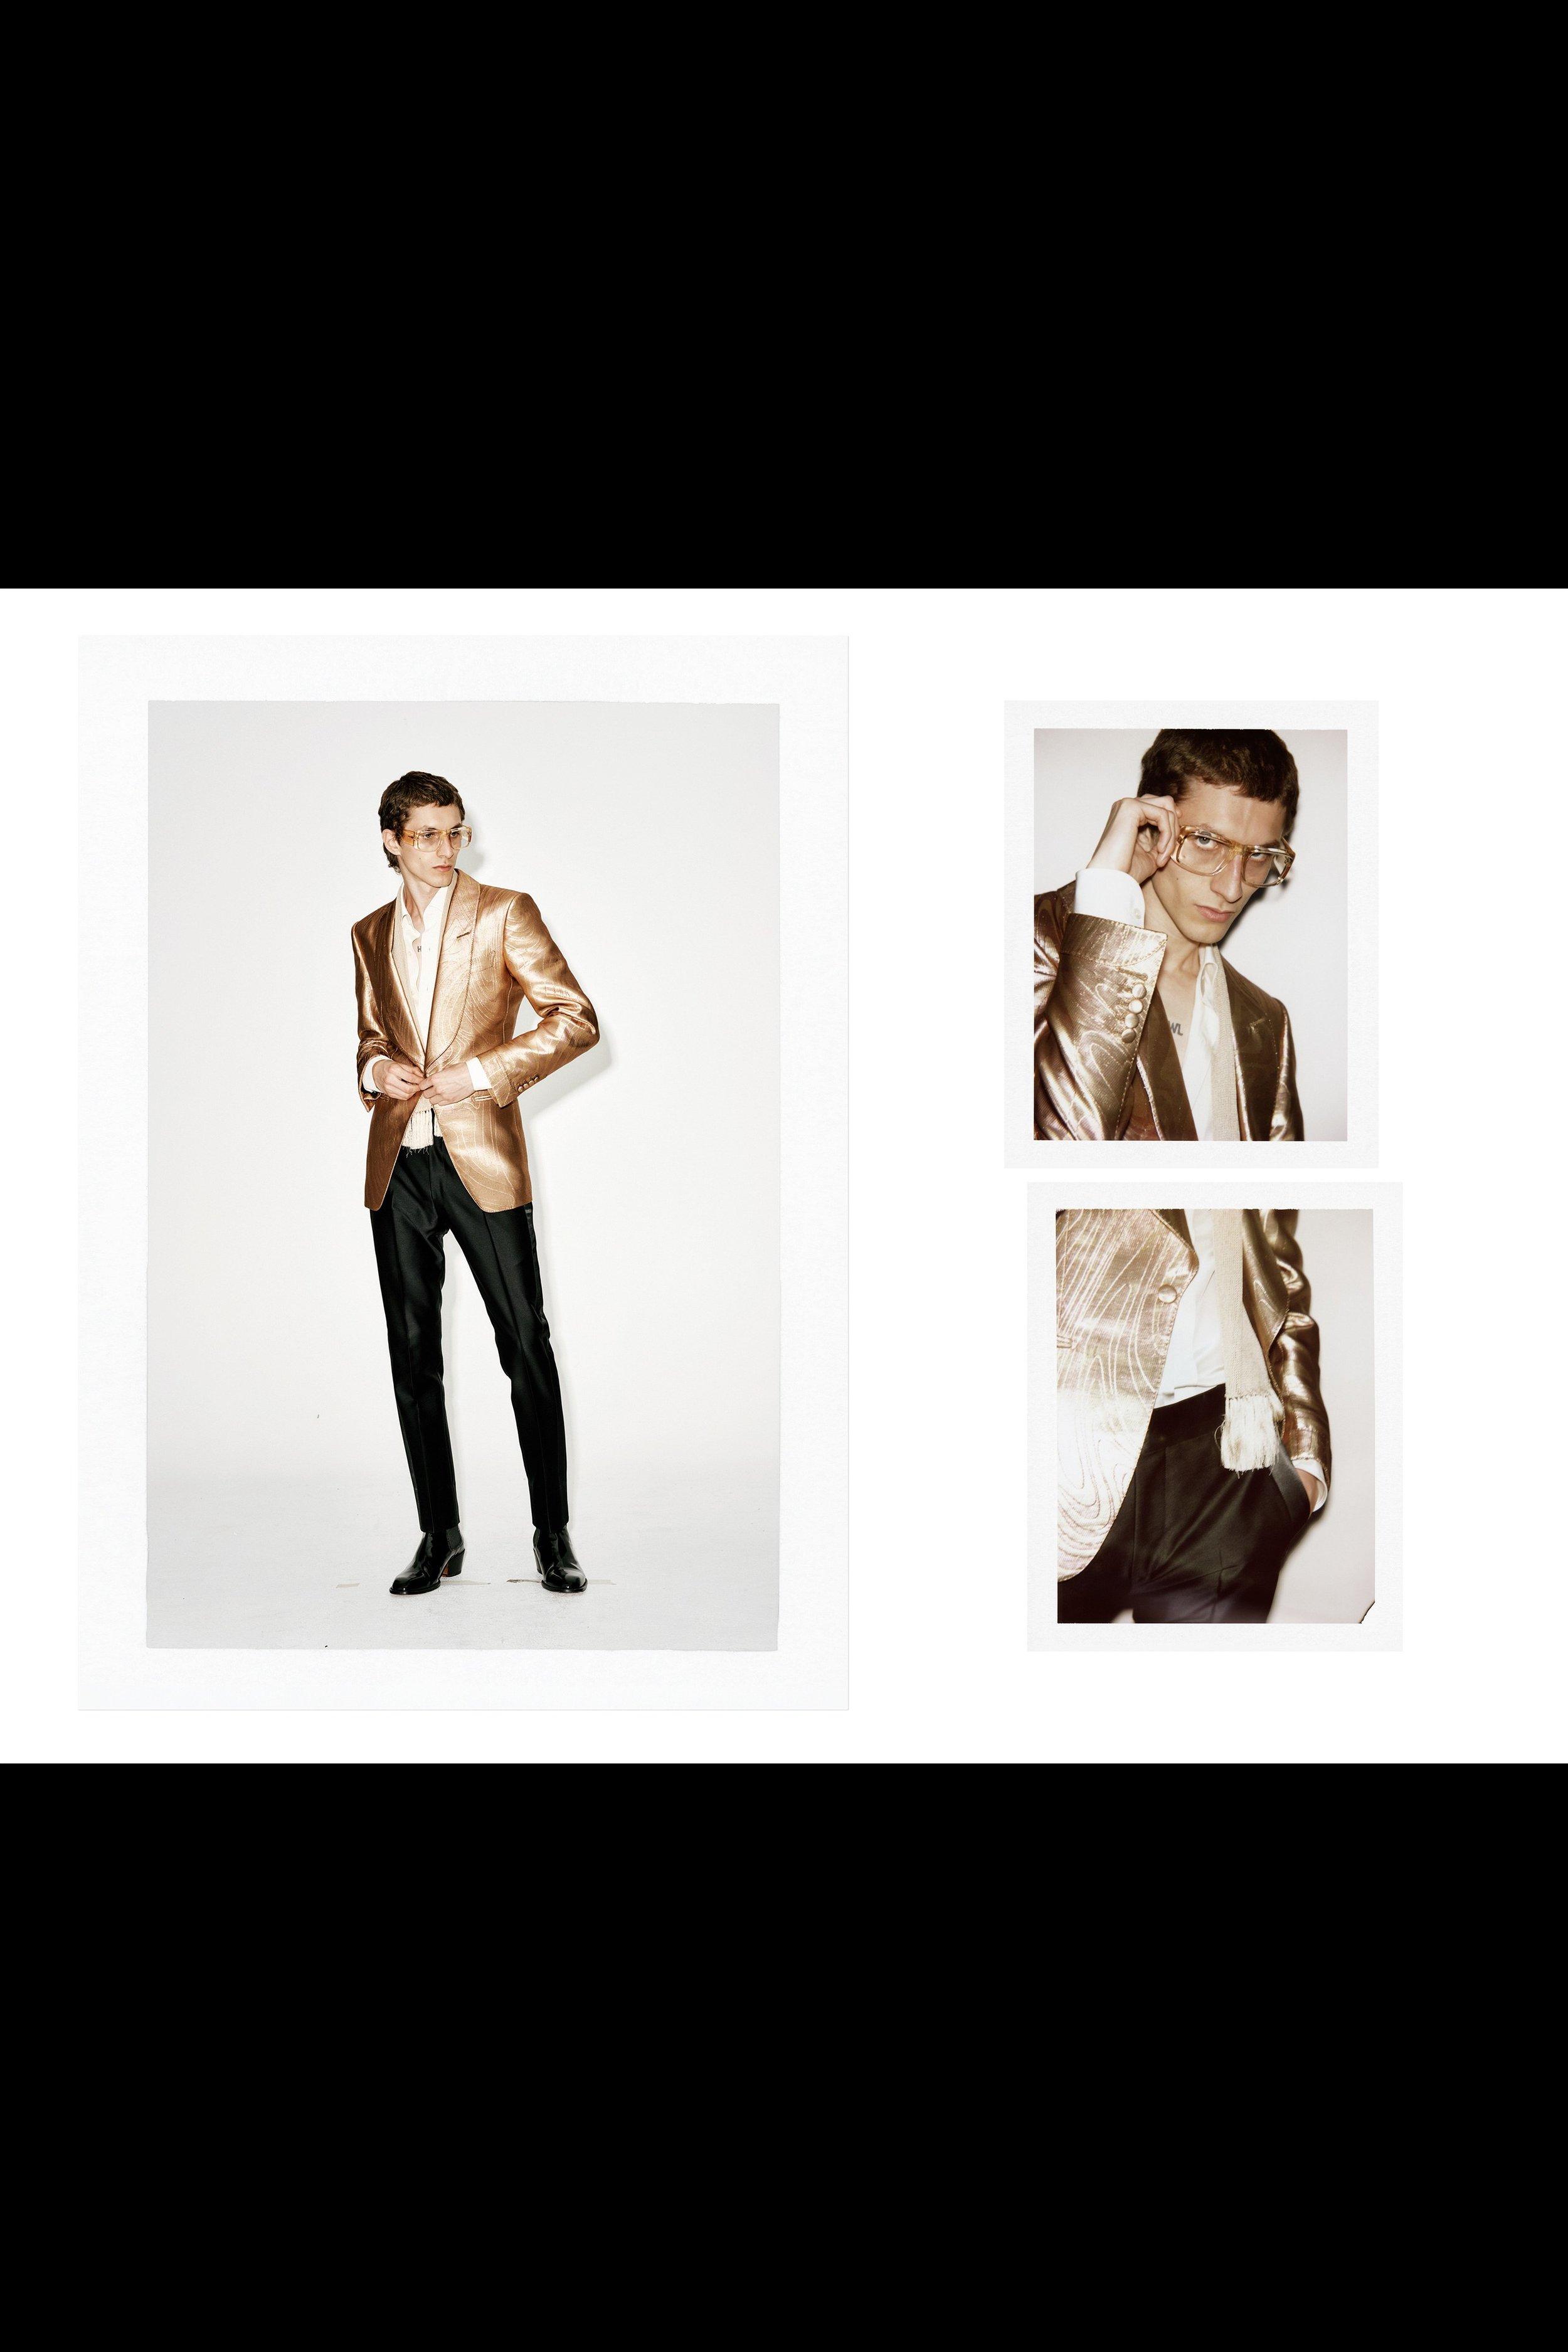 00039-Tom-Ford-vogue-menswear-spring-2019-pr.jpg